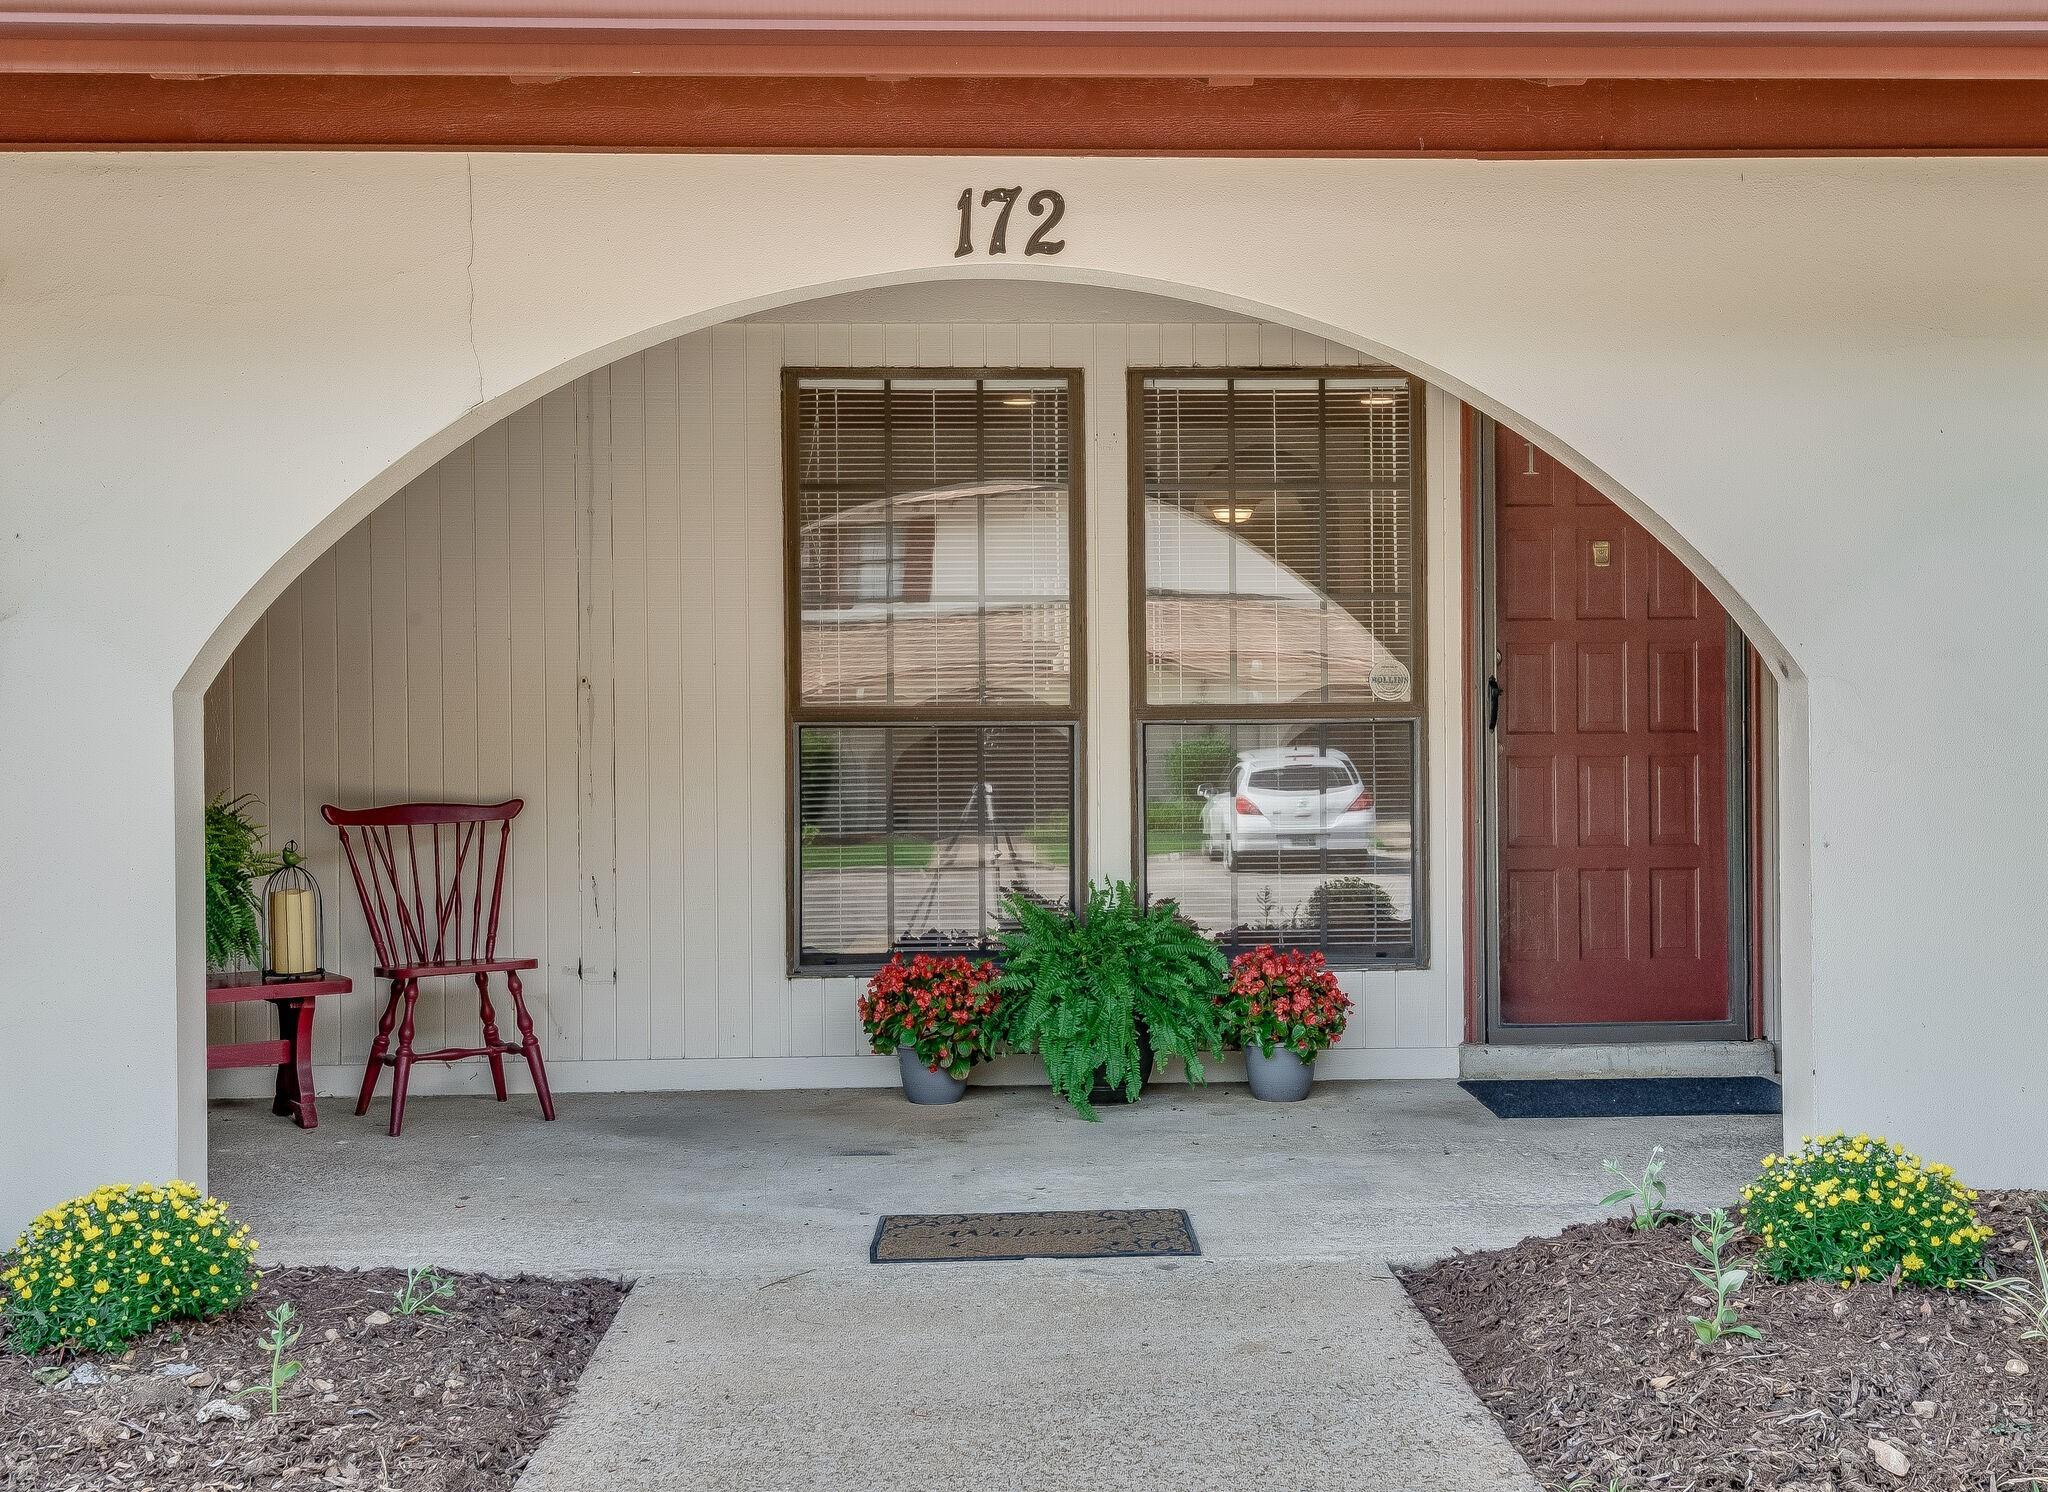 214 Old Hickory Blvd #172 Property Photo - Nashville, TN real estate listing